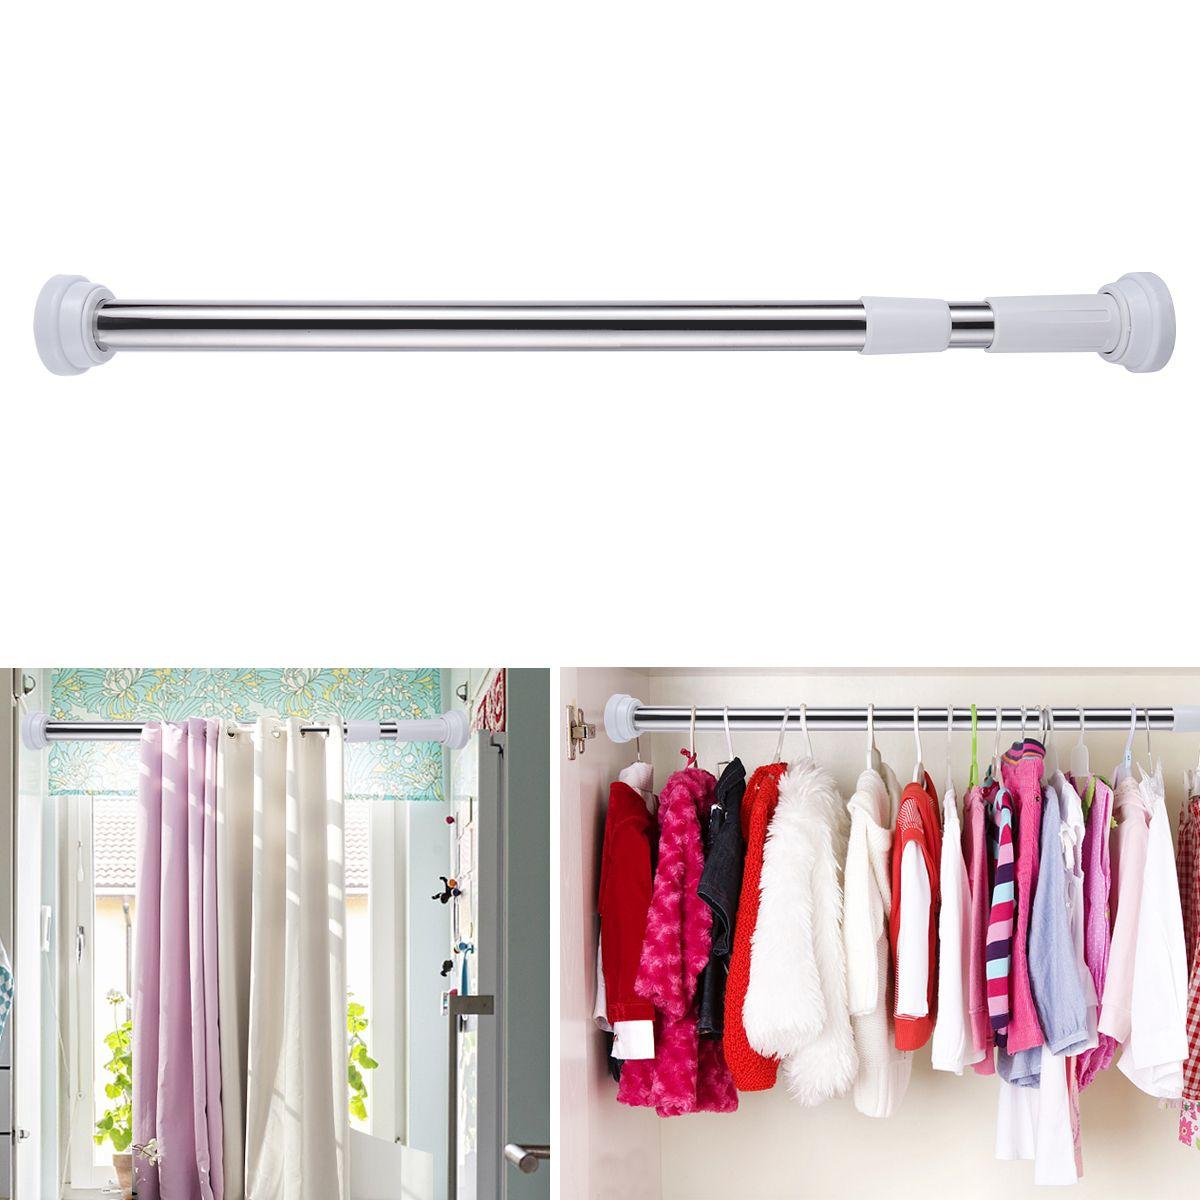 Discount Stainless Steel Bathroom Shower Curtain Rod Adjustable ...